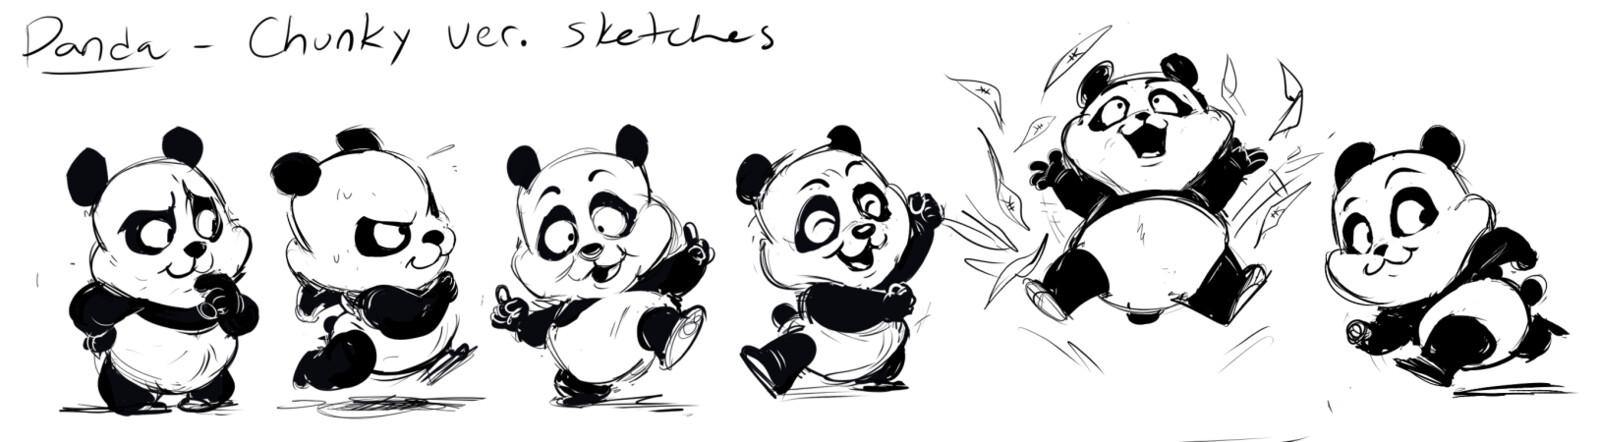 Panda - initial concept